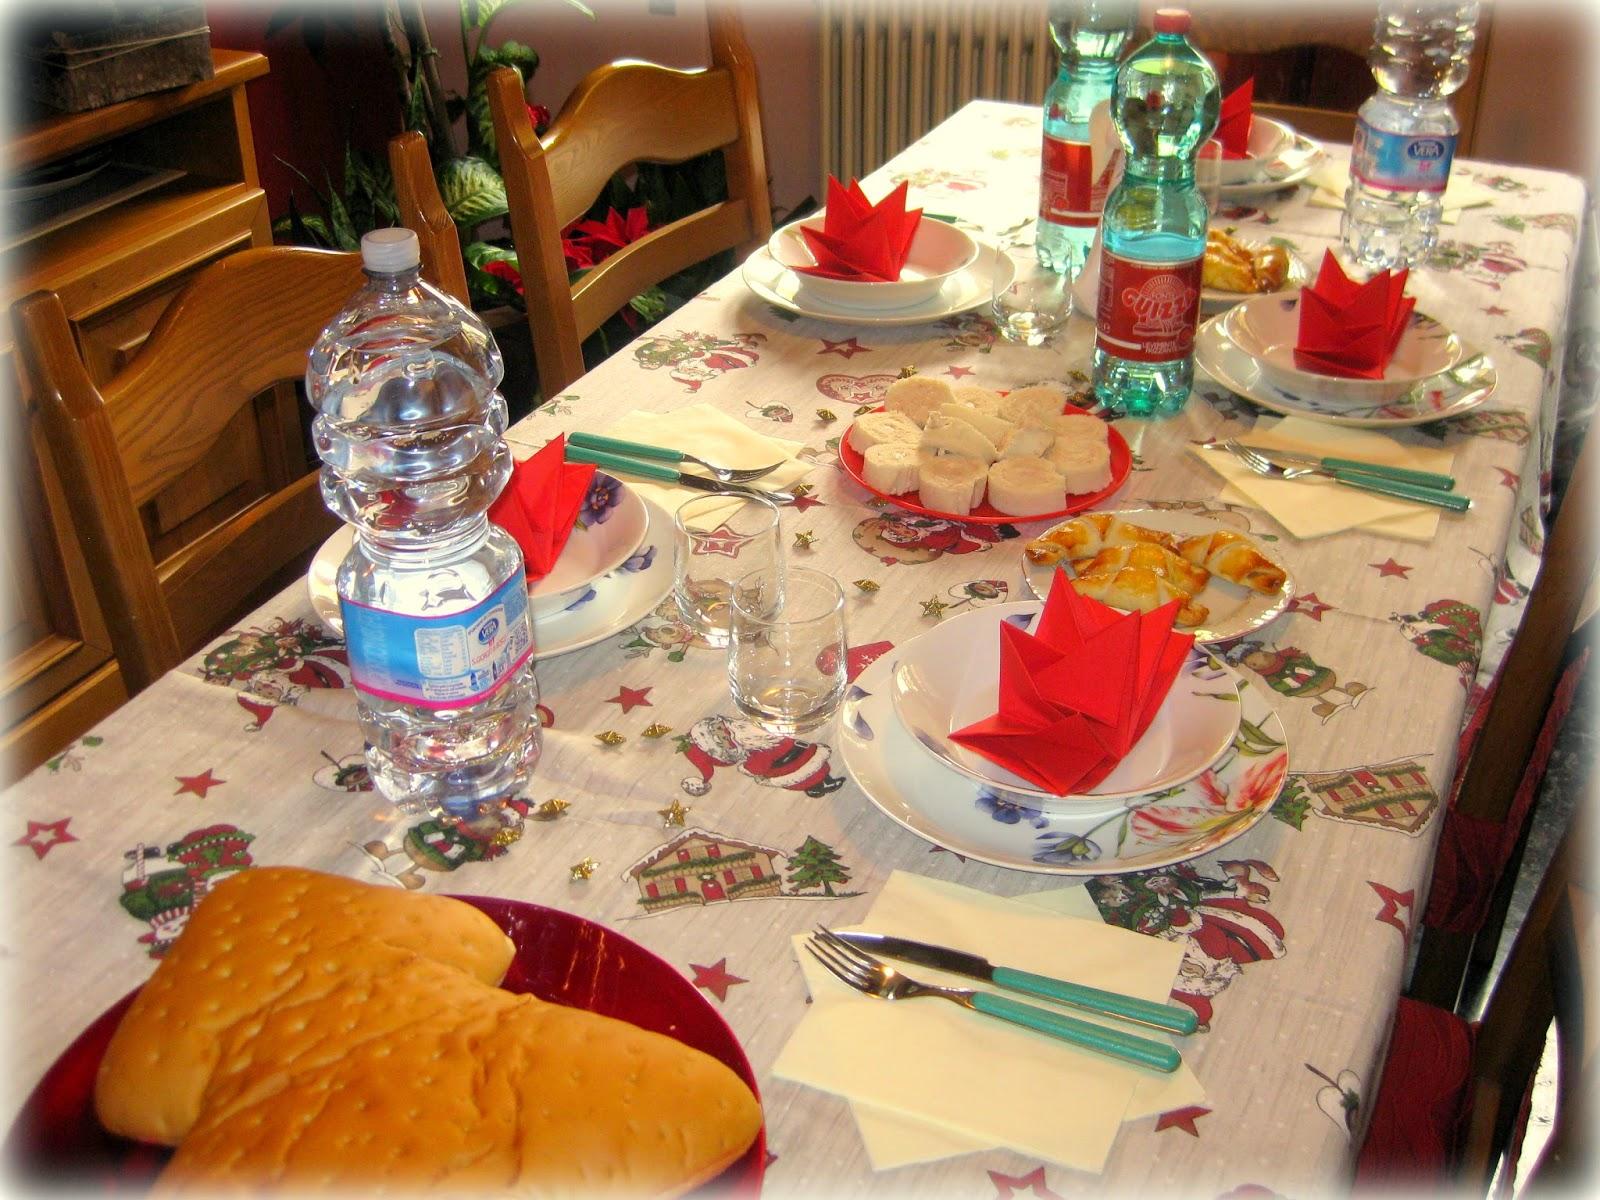 La mia tavola di natale - Addobbi natalizi sulla tavola ...